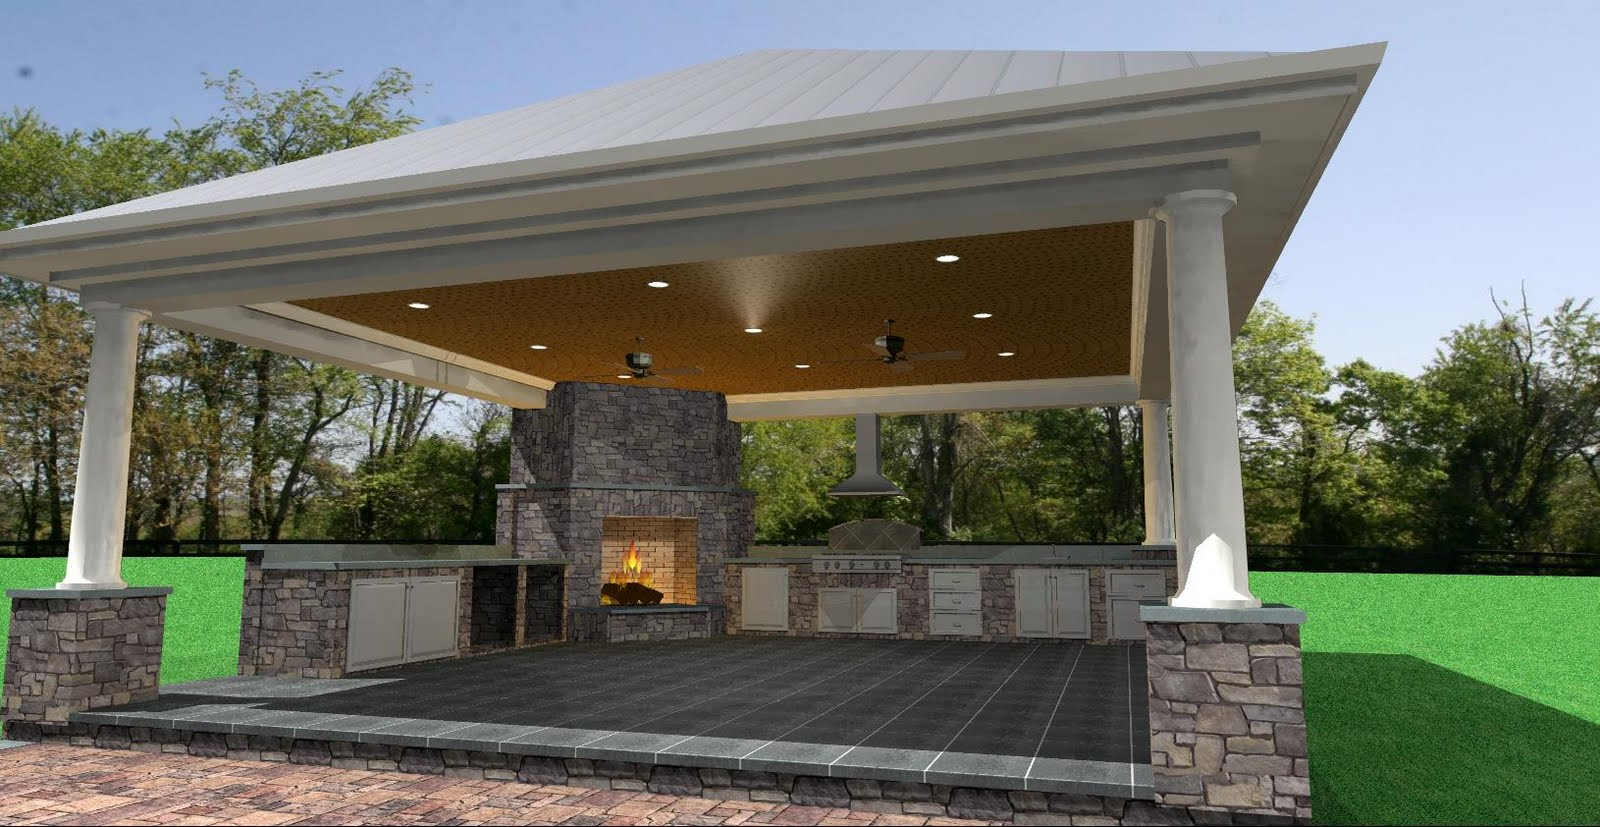 Cabana, Pool, and Hardscaping | Selah Design Services on Patio Cabana Ideas id=54258